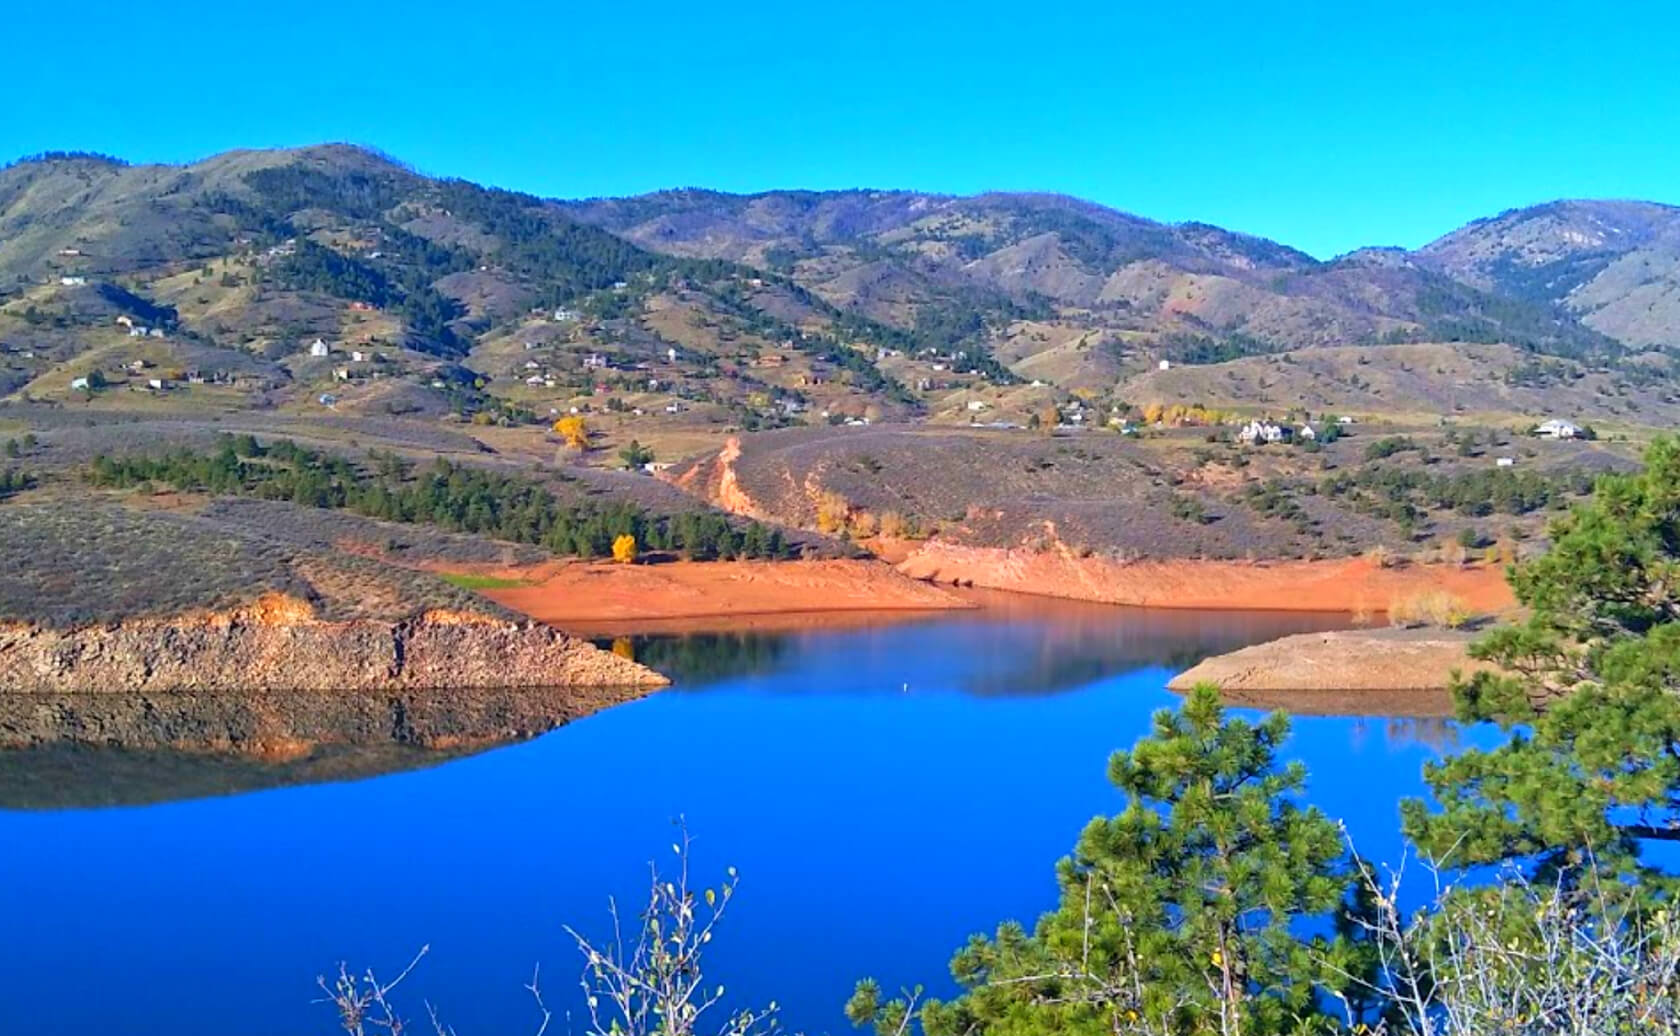 Horsetooth-Lake-Fishing-Guide-Report-Colorado-02